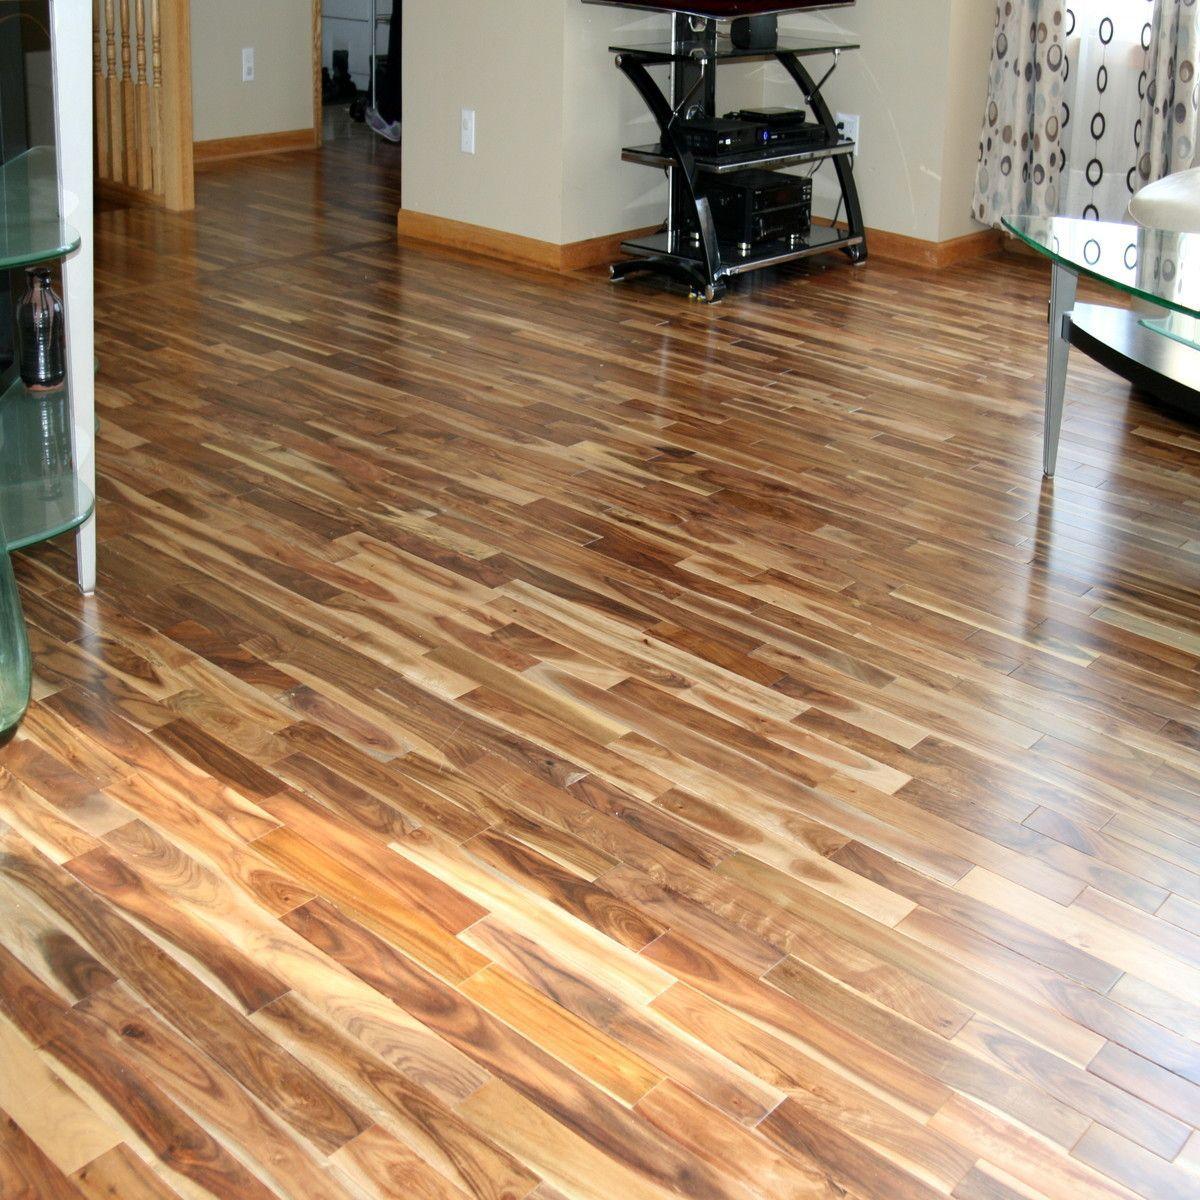 Acacia Blonde In 2019 Acacia Hardwood Flooring Hardwood